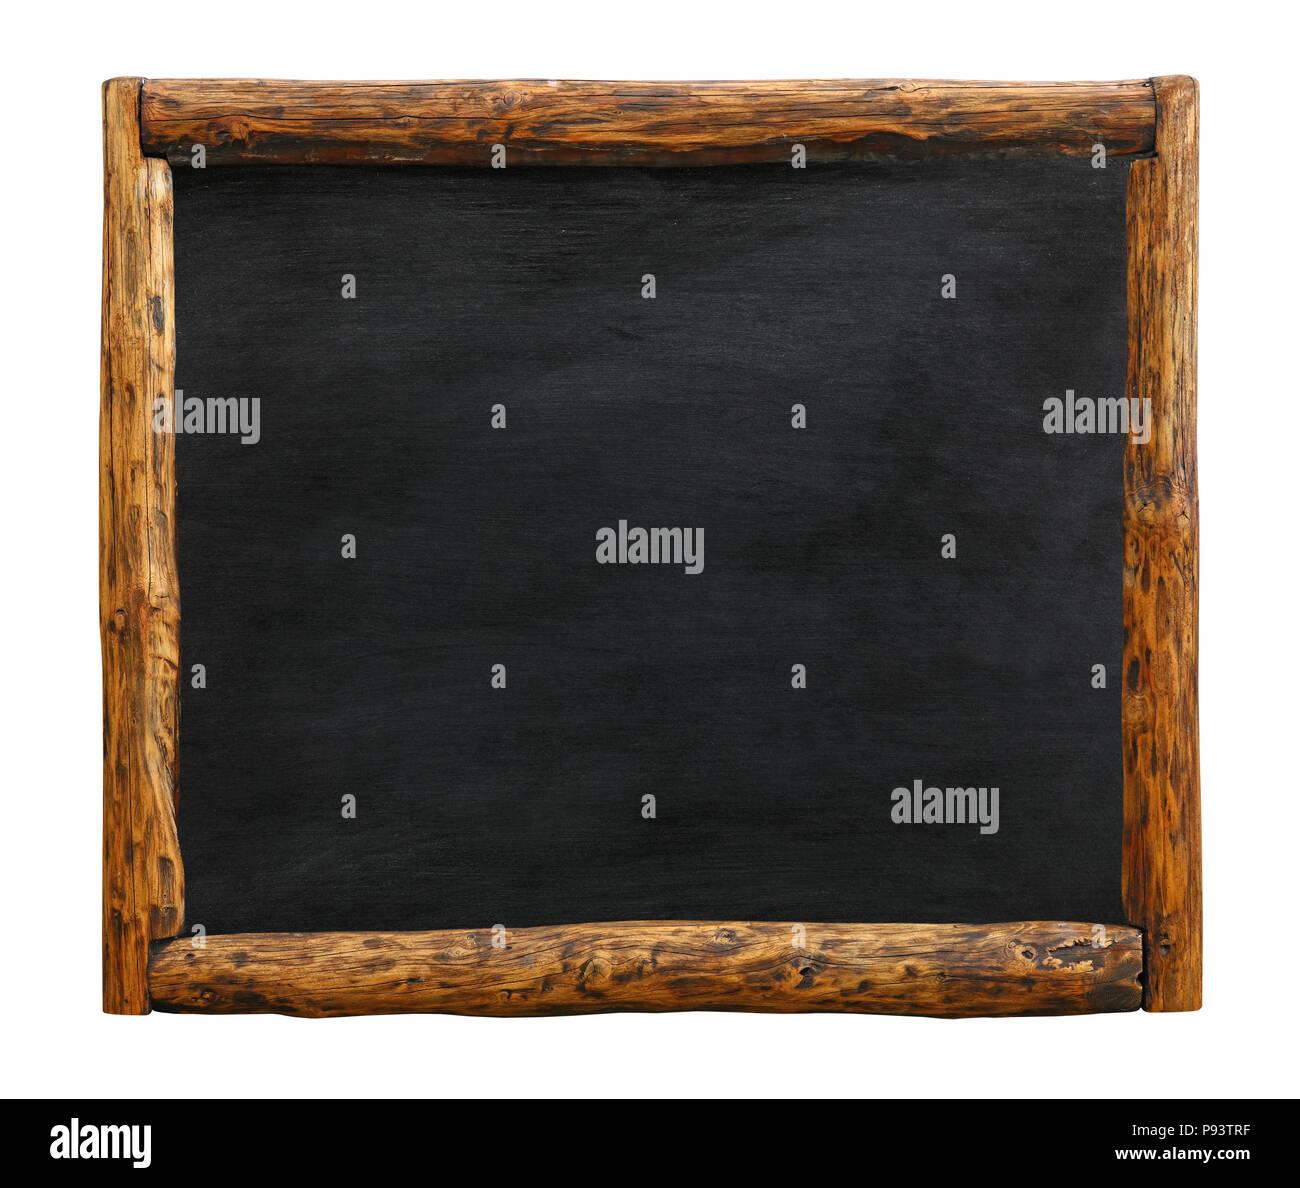 Old vintage black chalkboard empty blank sign with grunge brown aged ...